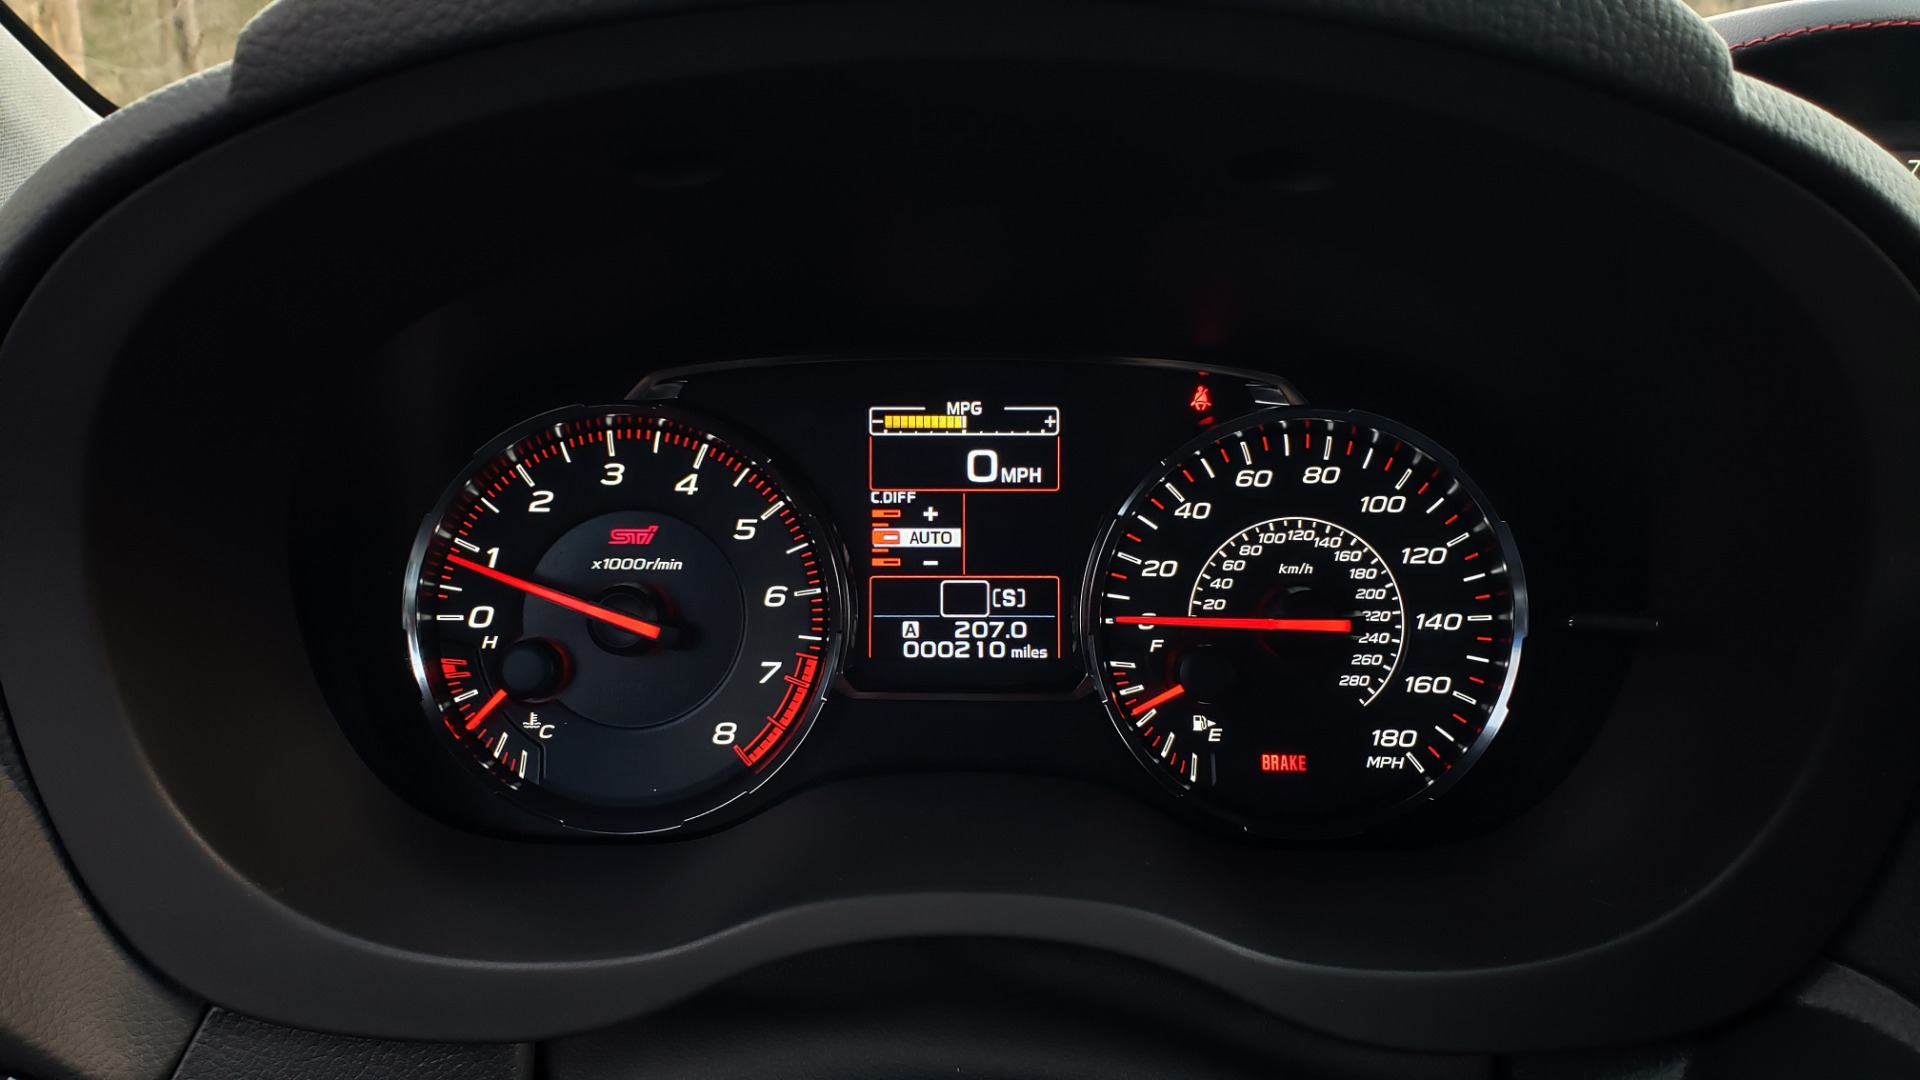 Used 2020 Subaru WRX STI 2.5L TURBO / 6-SPEED MANUAL / RECARO SEATS / REARVIEW for sale Sold at Formula Imports in Charlotte NC 28227 52